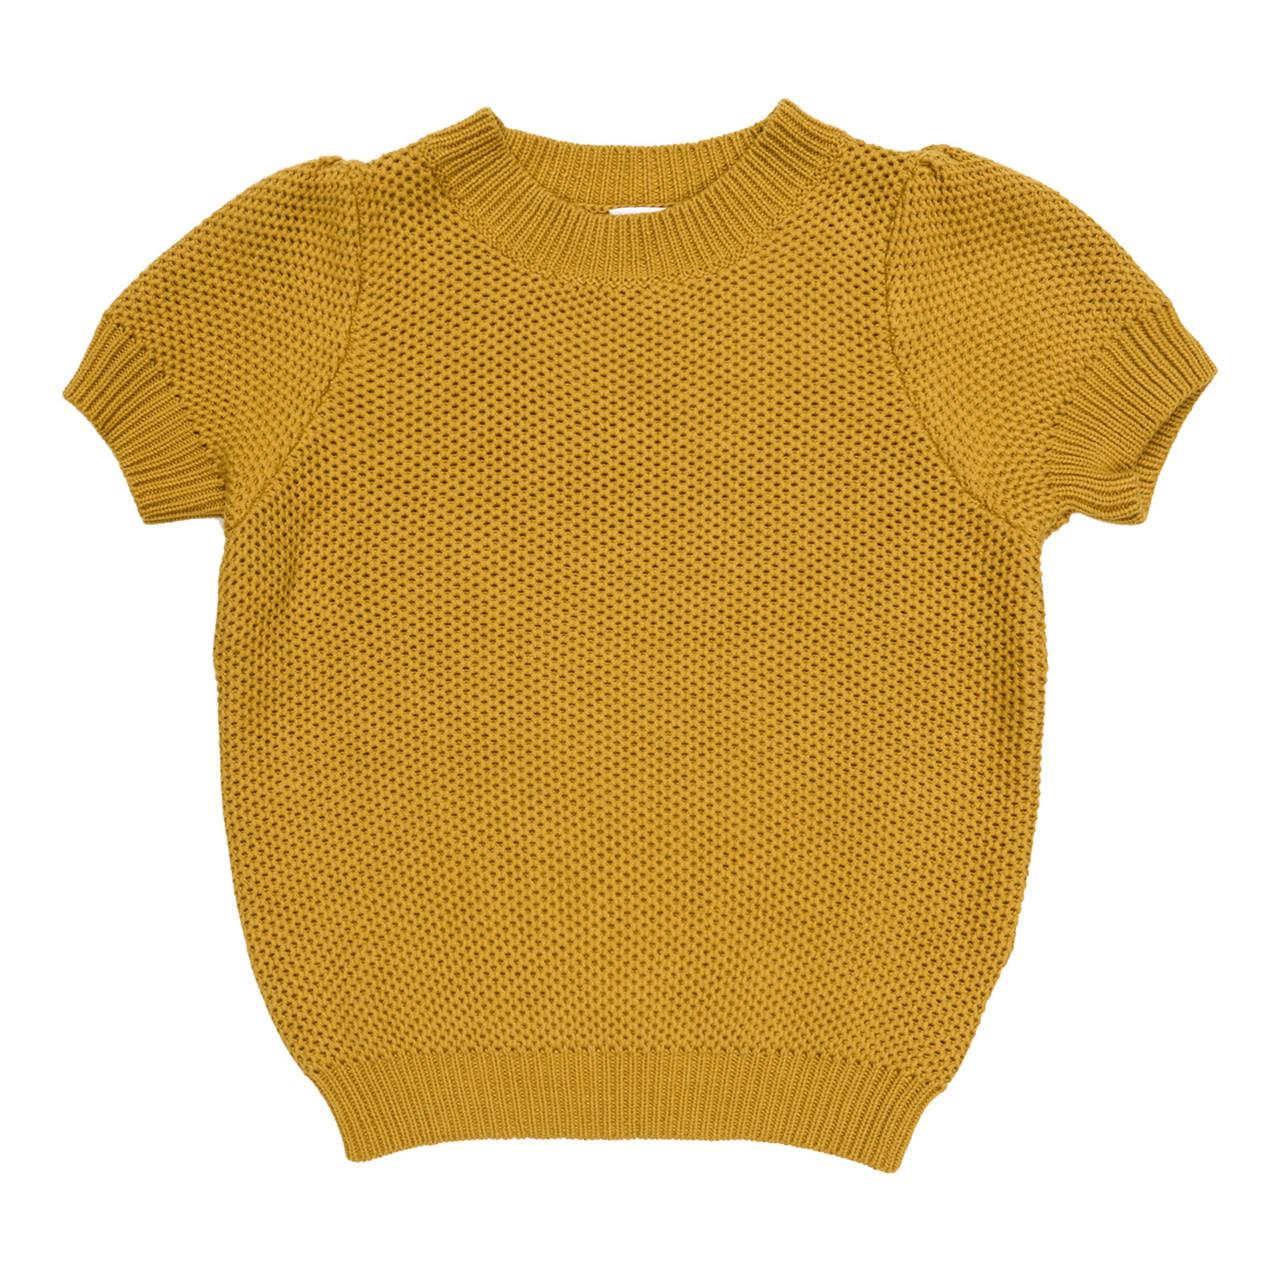 Maed For mini Maed for Mini - Golden Grasshopper Knit Top